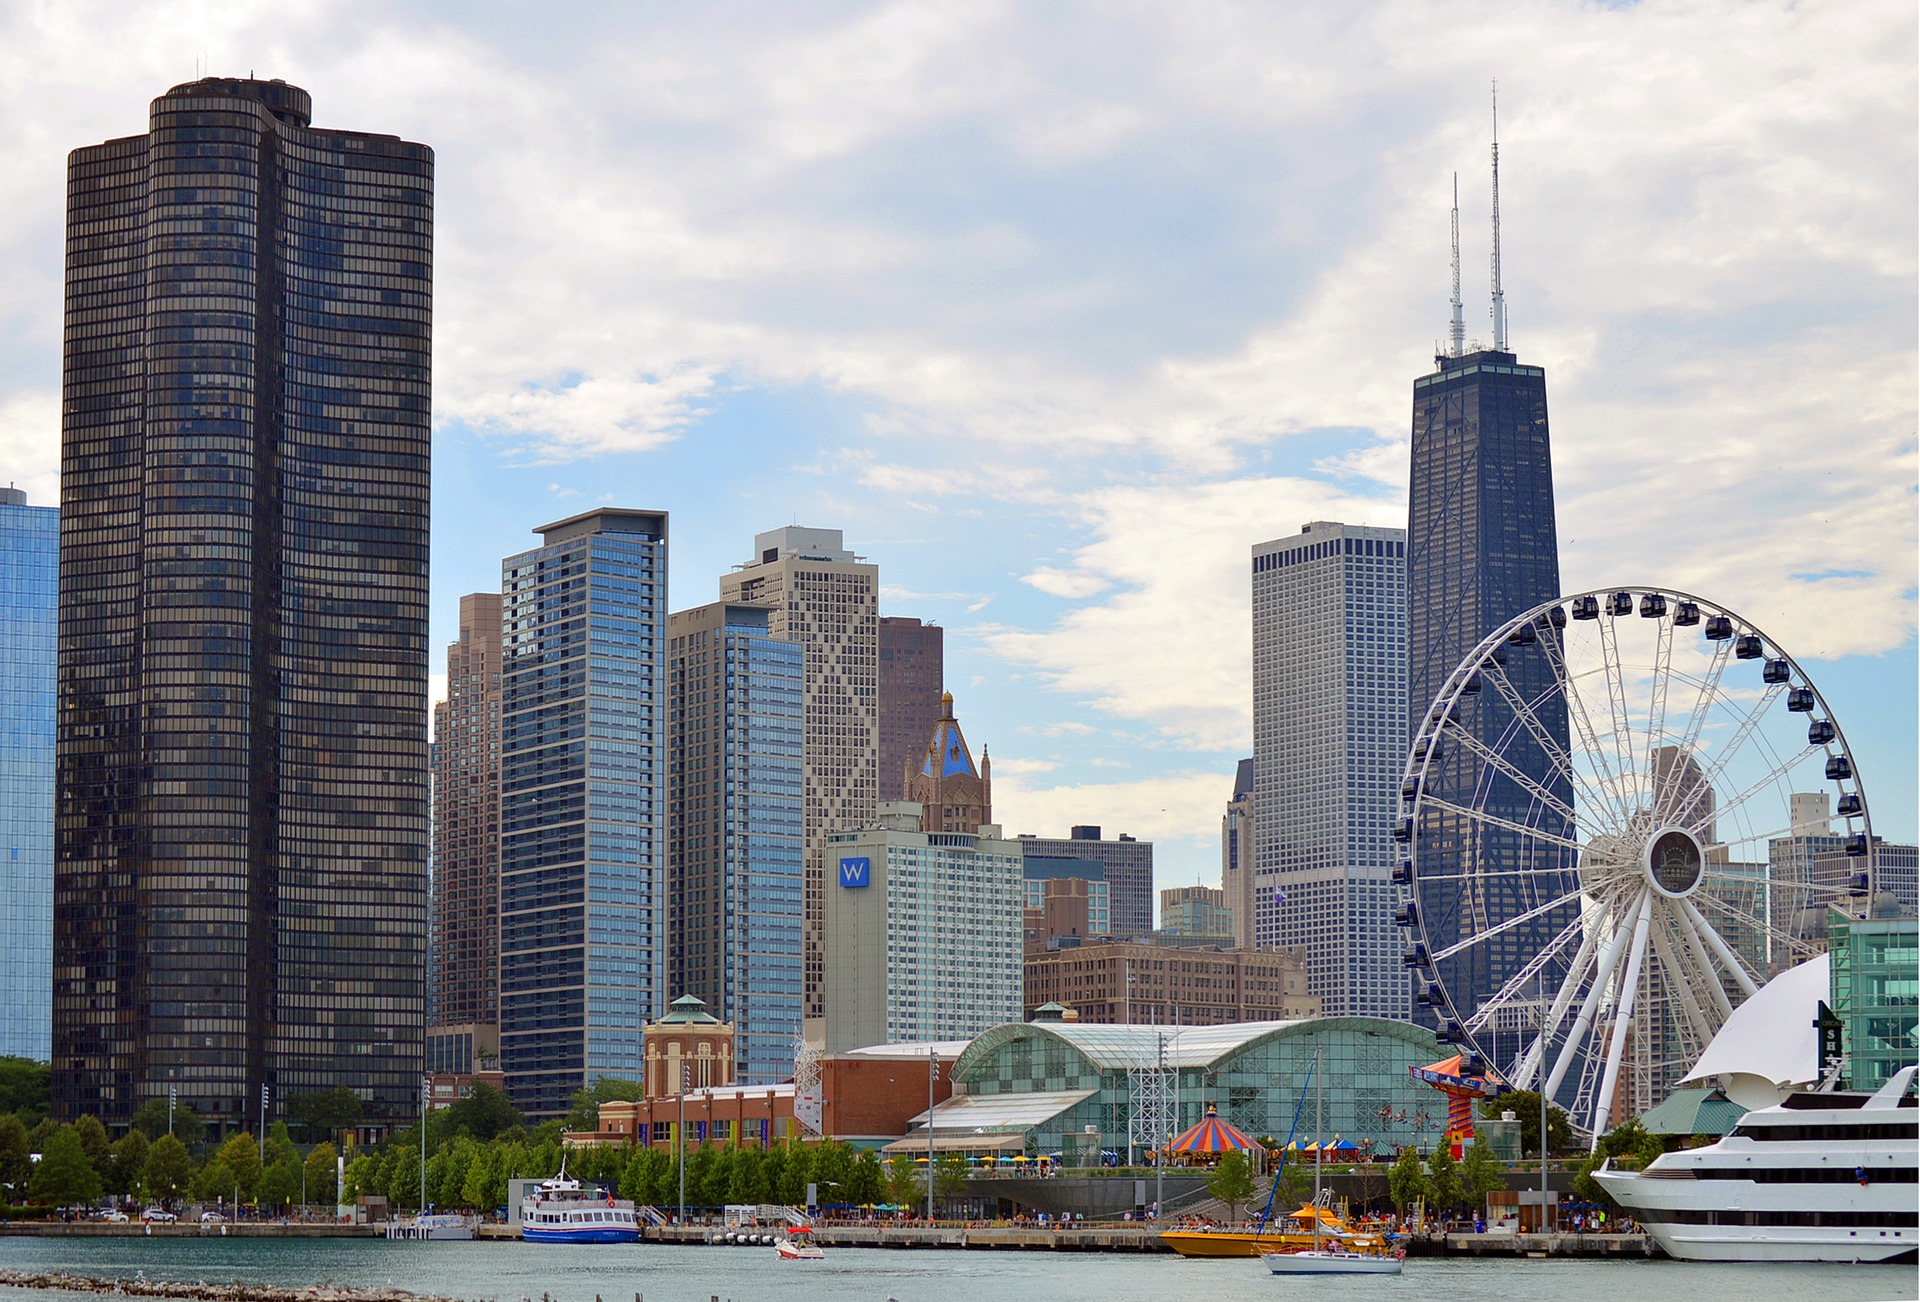 Chicago waterfront, navy pier